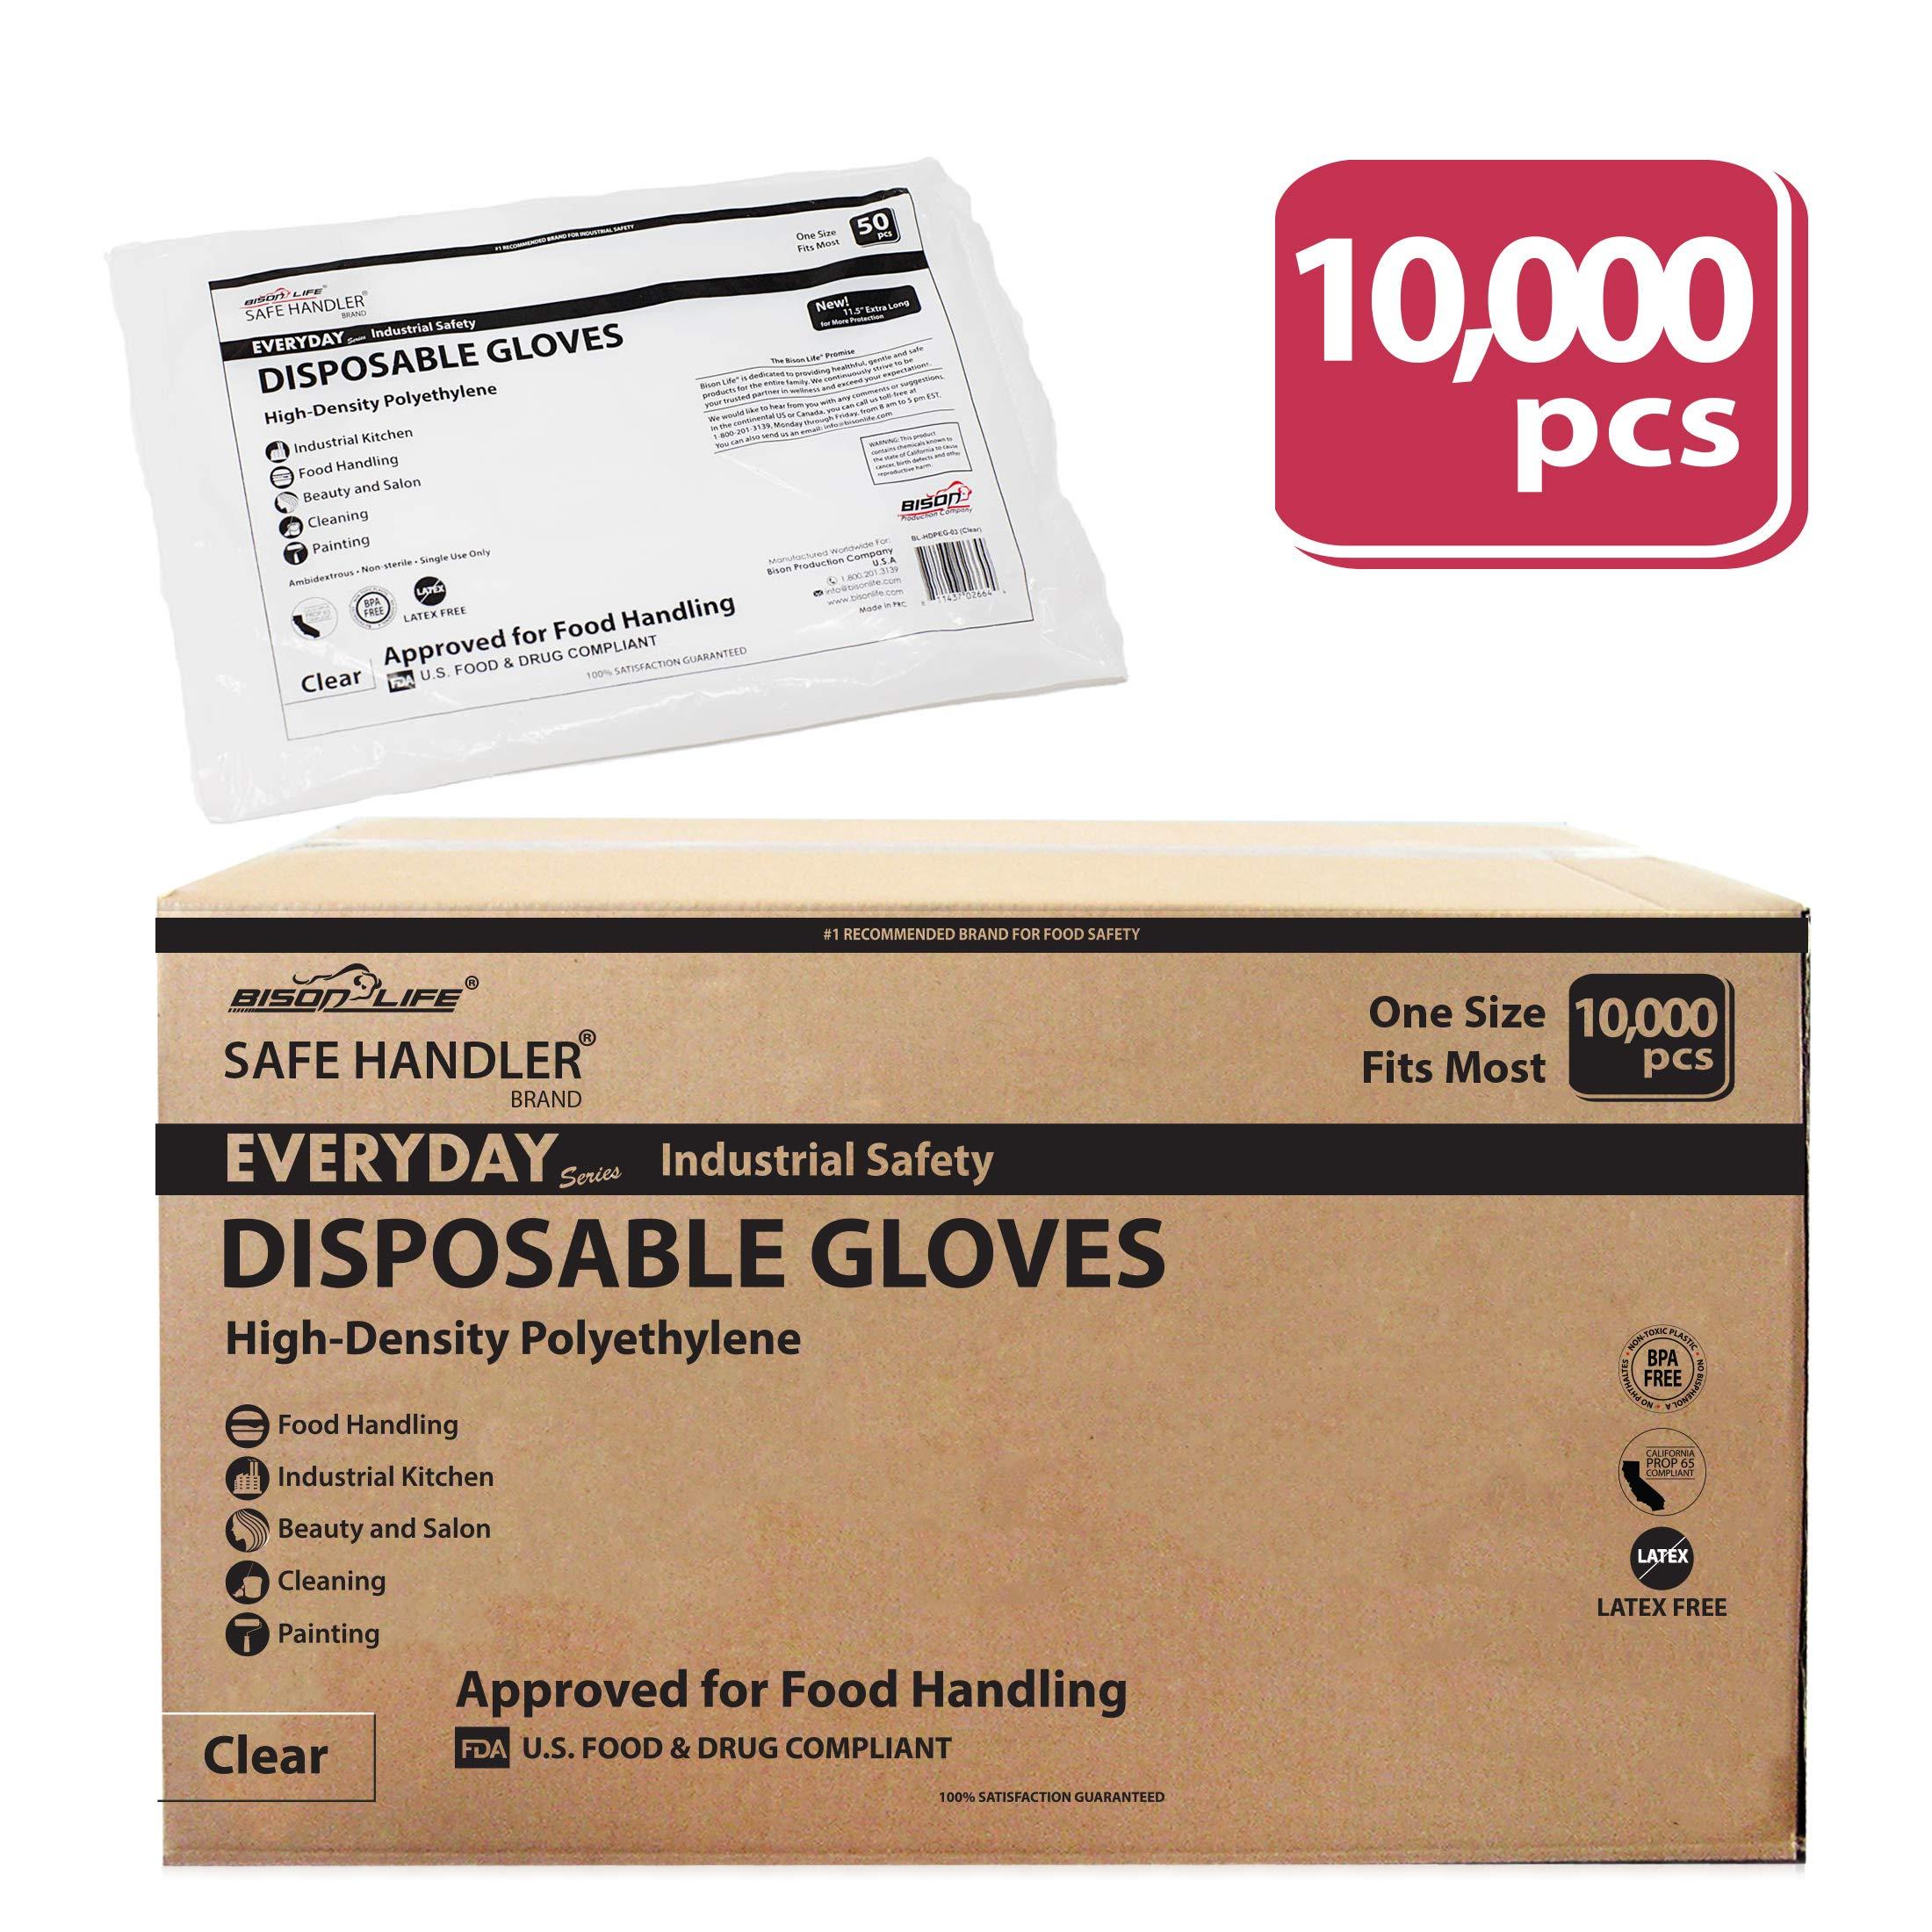 SAFE HANDLER Disposable Food Handling Long Cuff Poly Gloves | One Size Fits Most, 0.65g, 11'', 200 Packs of 50 Gloves, (10,000 Gloves Total) by Safe Handler